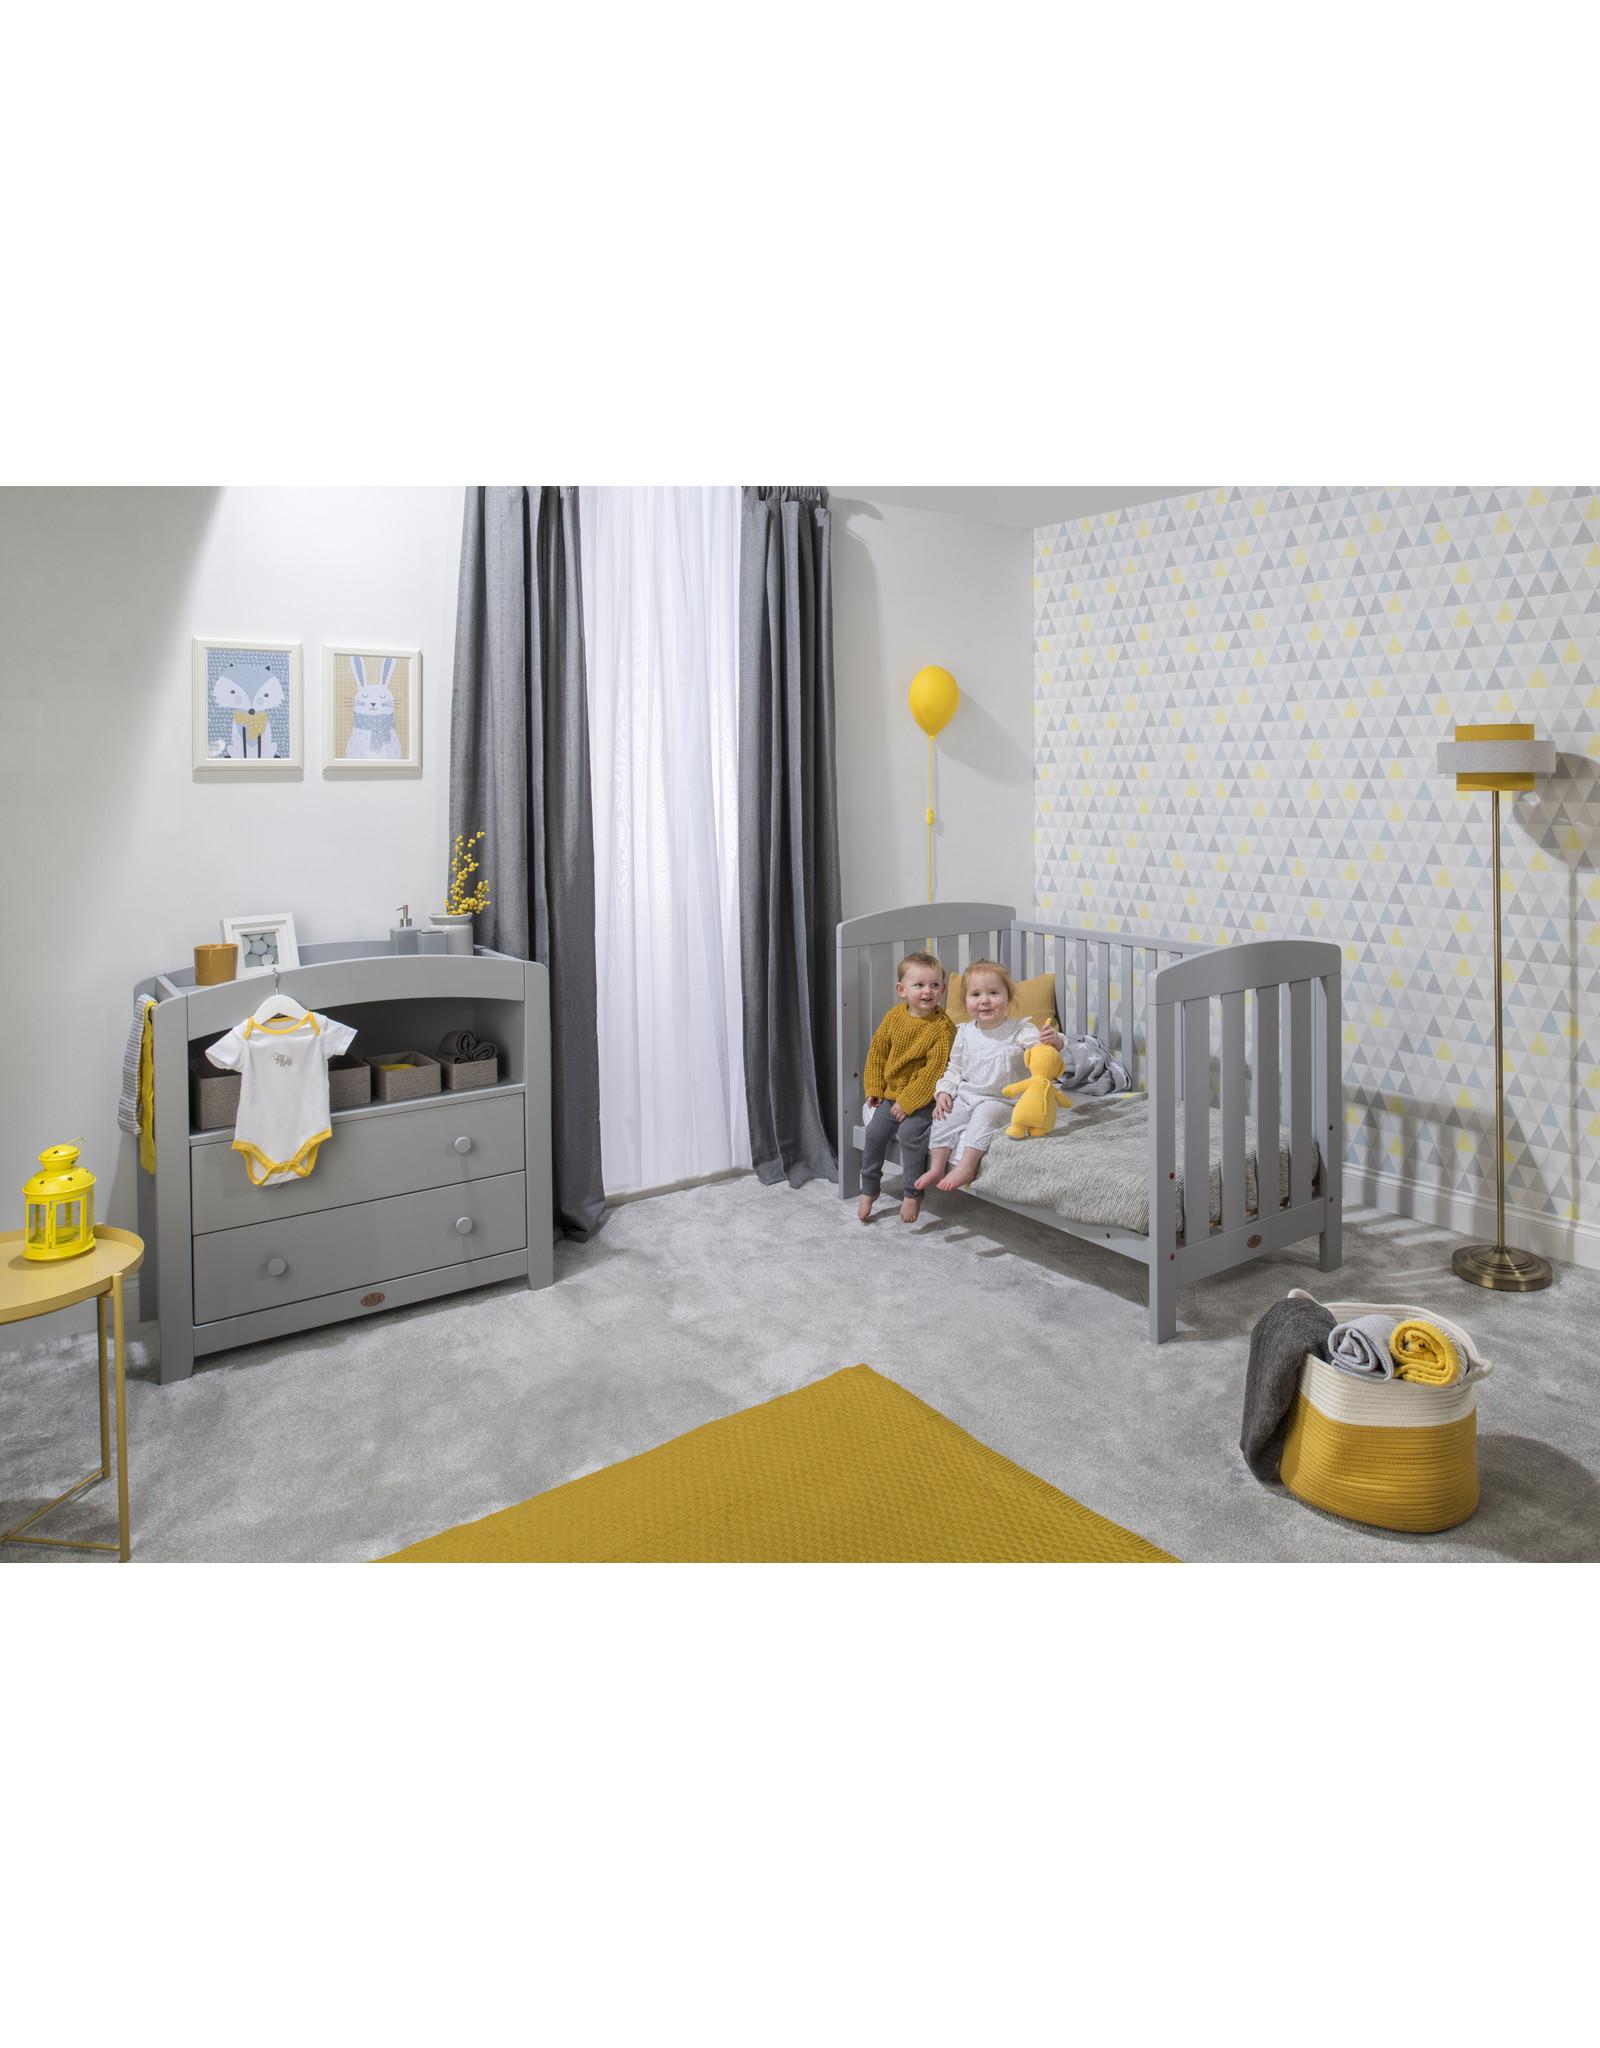 Boori Boori Alice 2 Piece Nursery Set with Chest Changer -Pebble